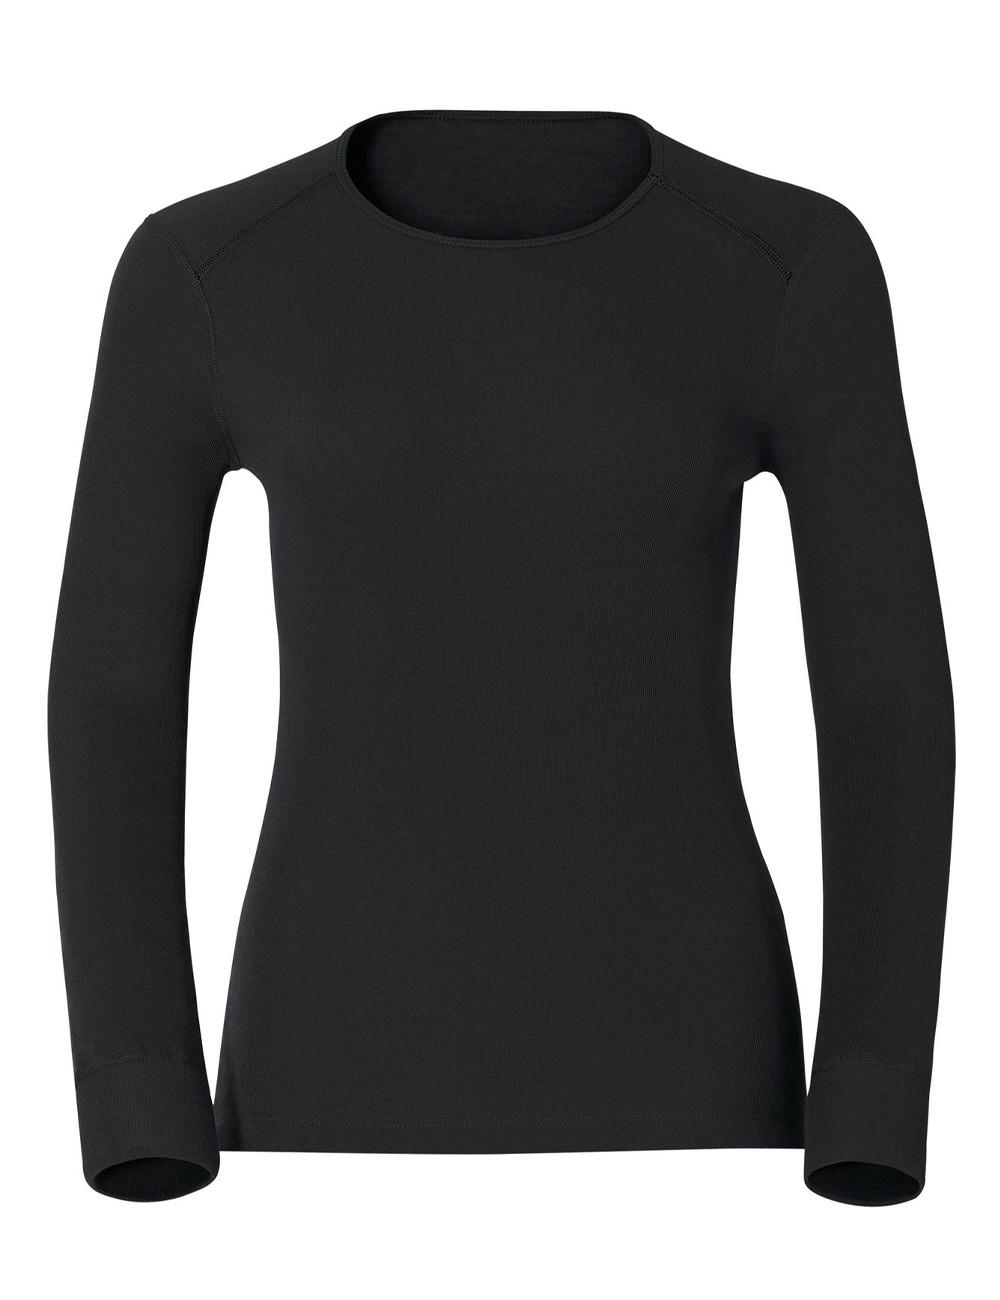 Koszulka termoaktywna damska ODLO ACTIVE Originals WARM